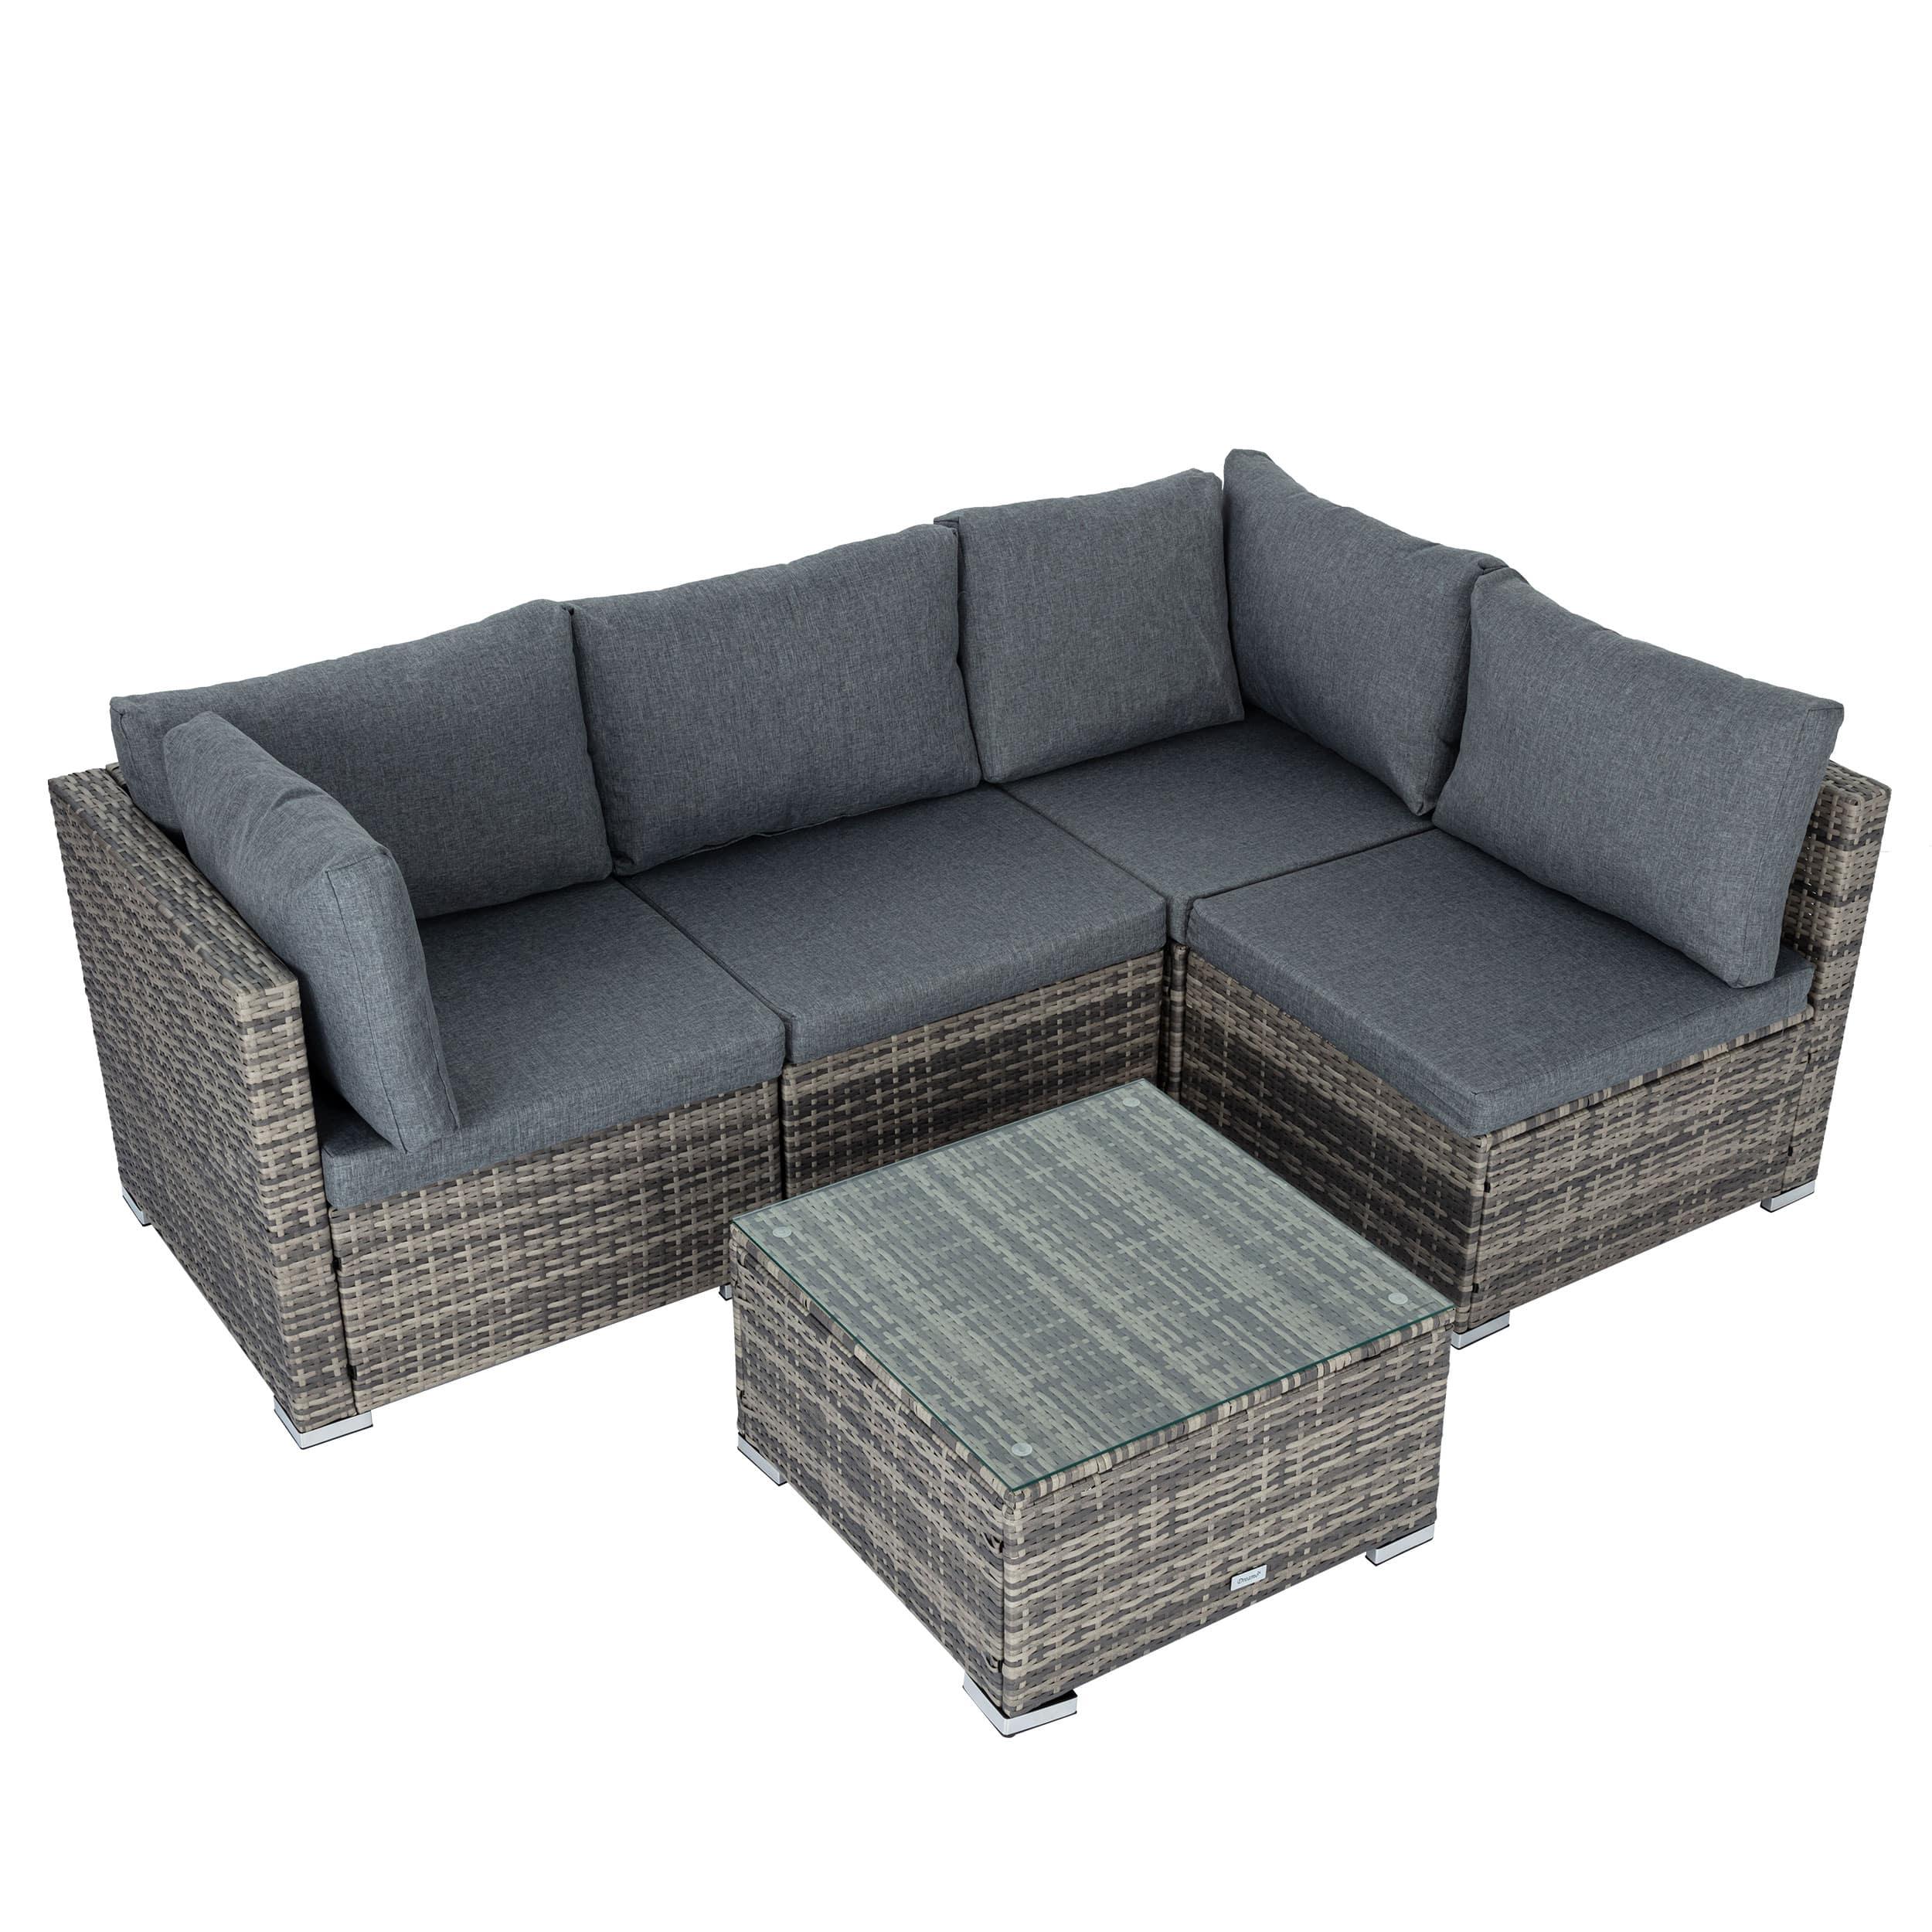 Outdoor Modular Lounge Sofa Bondi -Grey